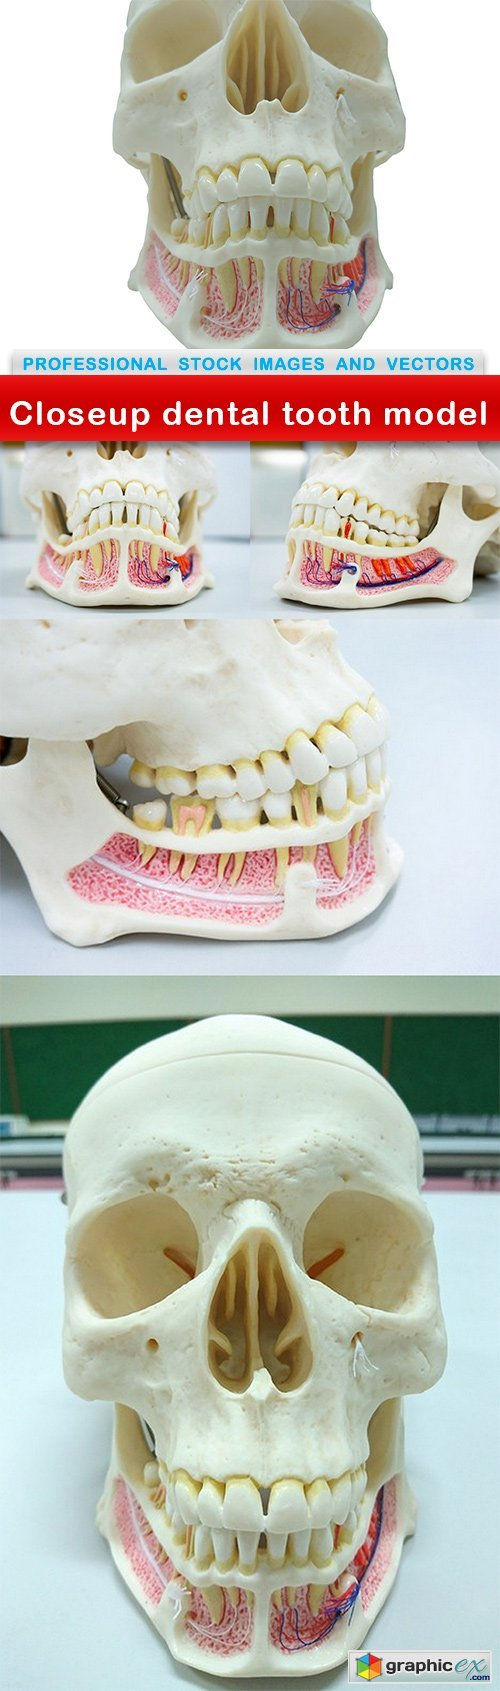 Closeup dental tooth model - 5 UHQ JPEG